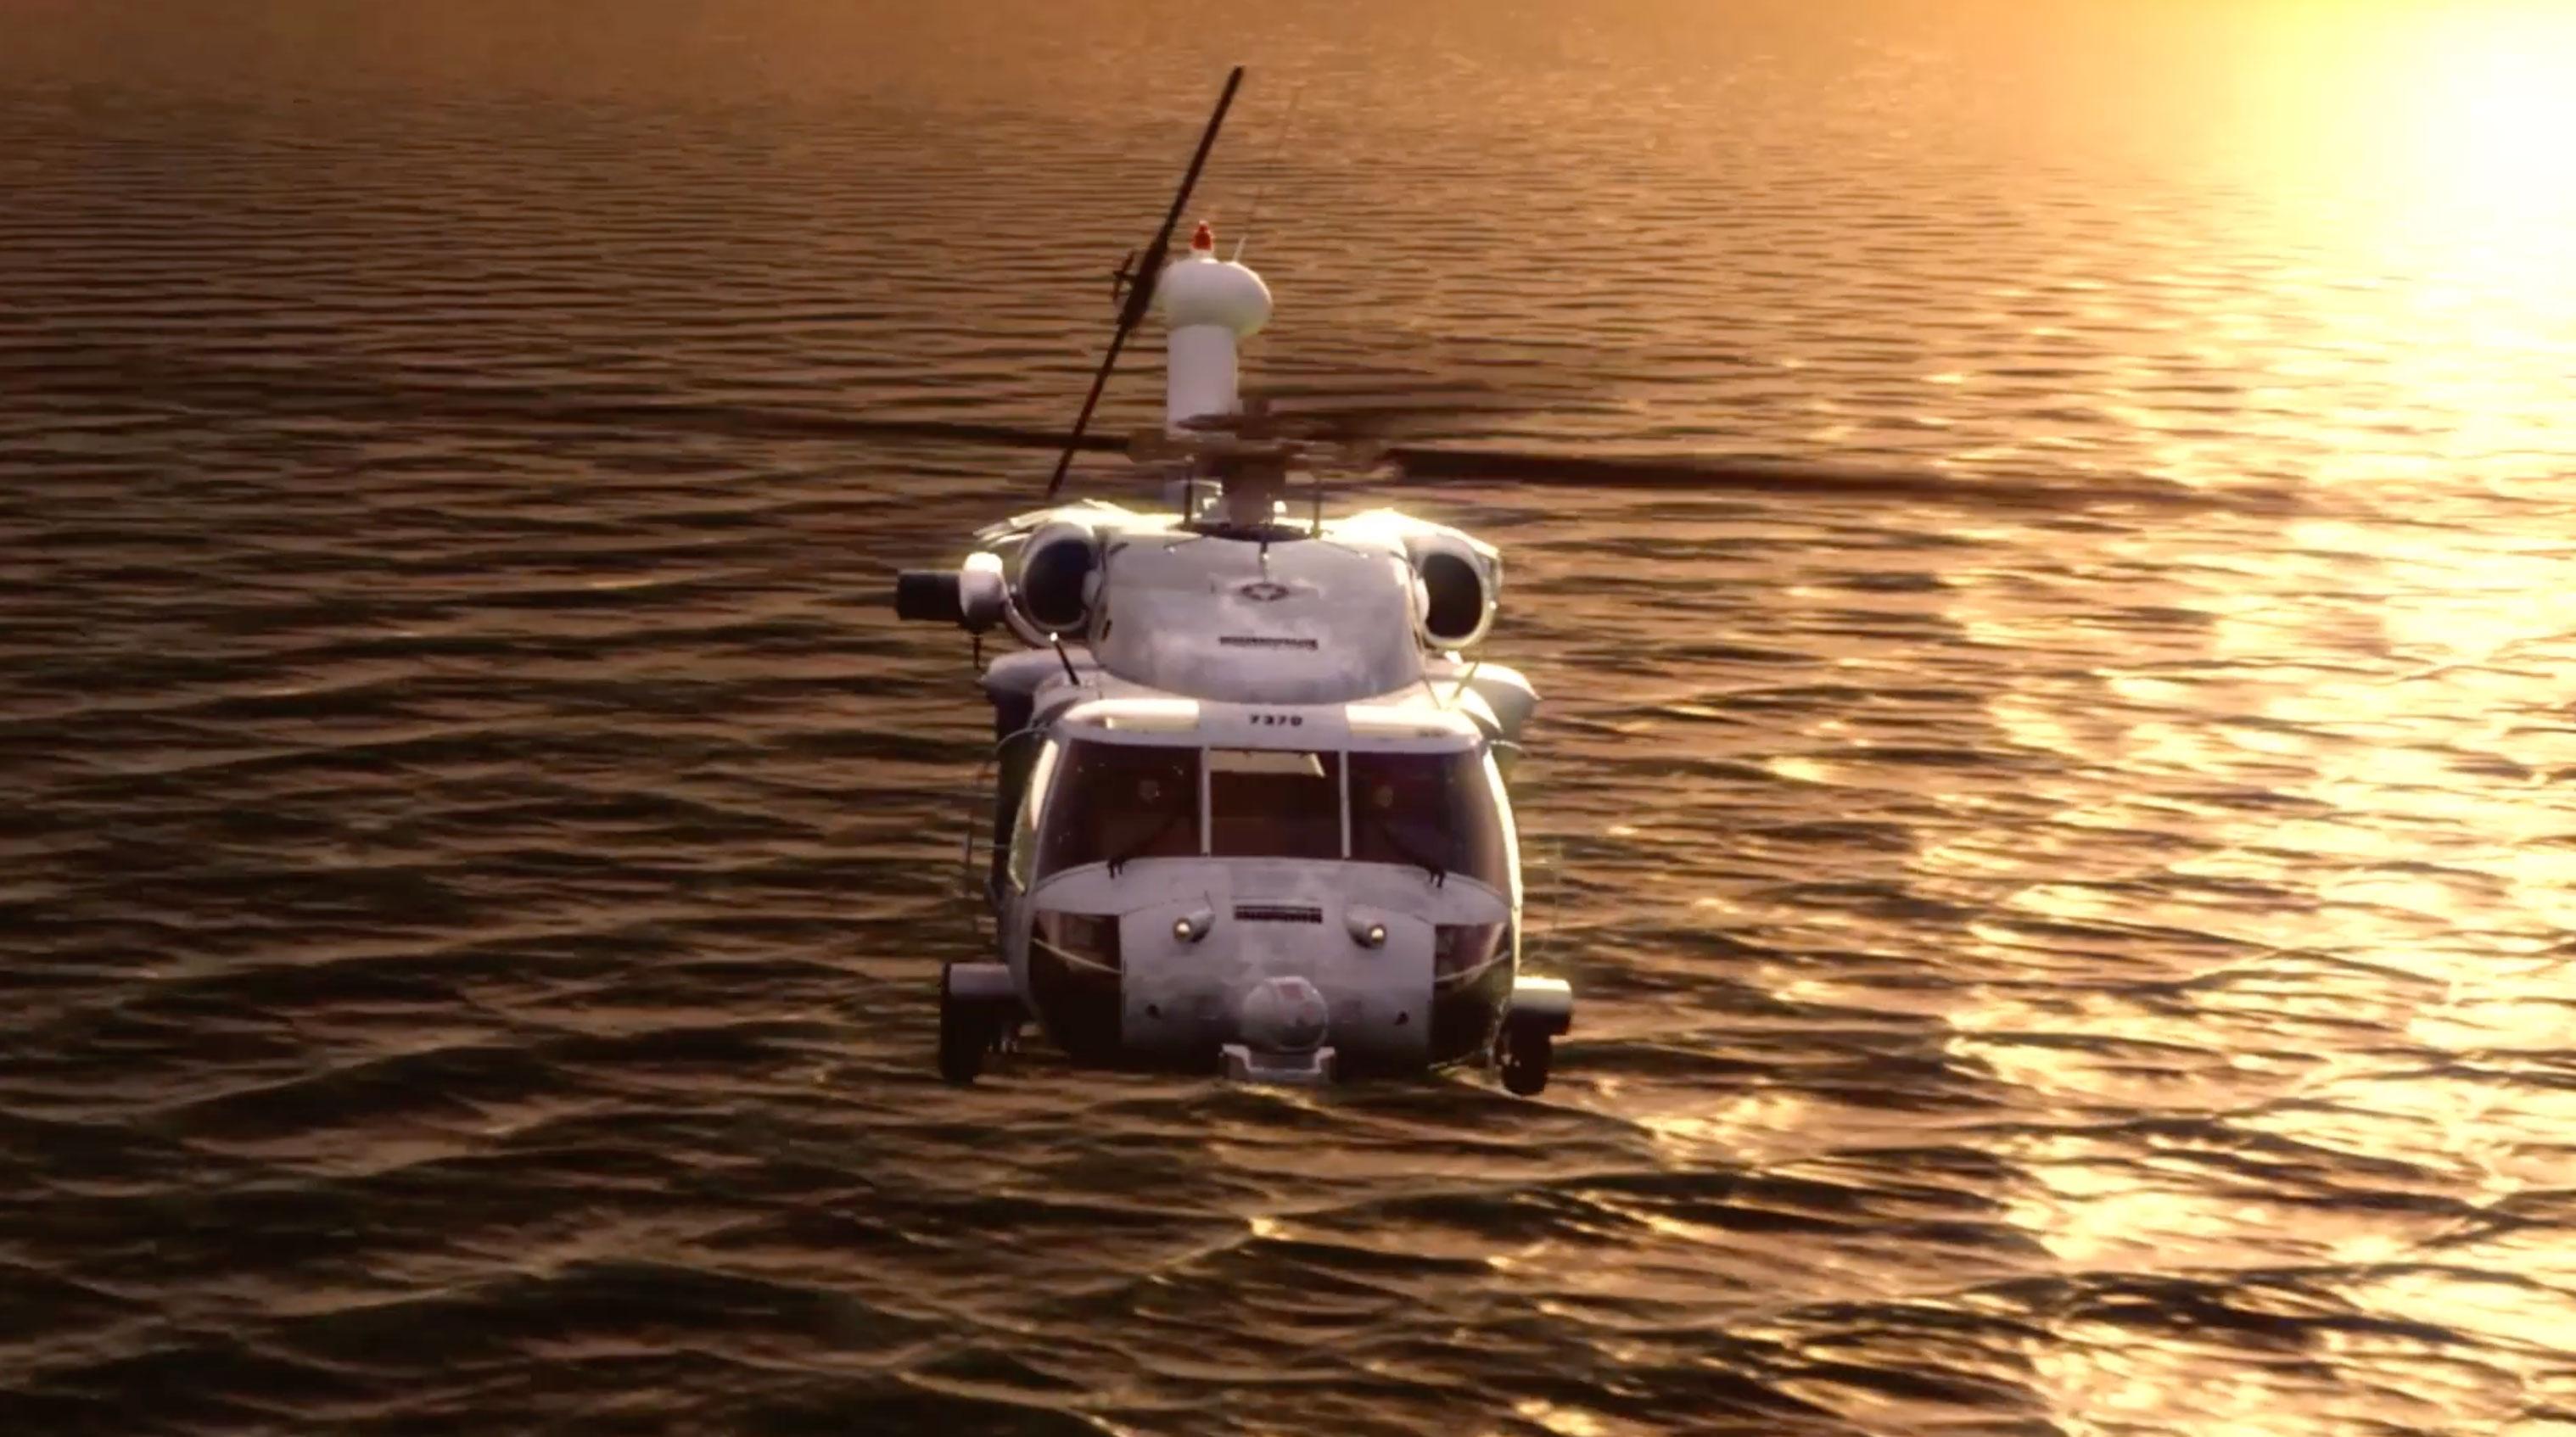 Bal Seal Engineering – Helicopter 3D Rendering